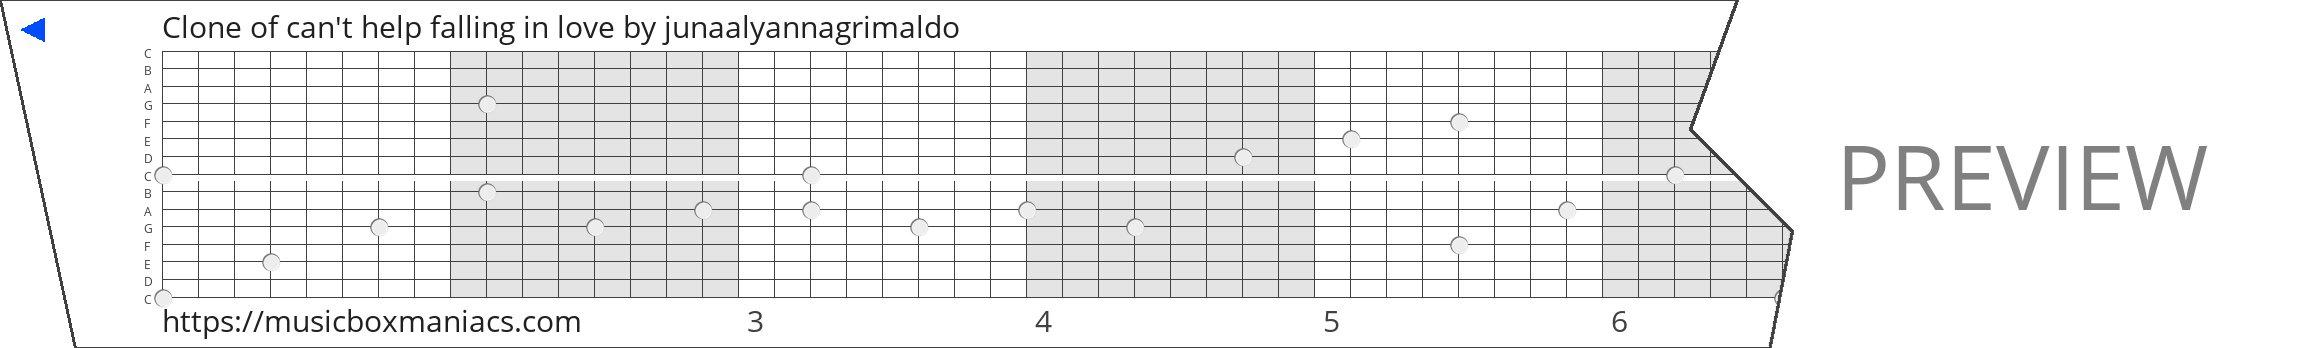 Clone of can't help falling in love 15 note music box paper strip